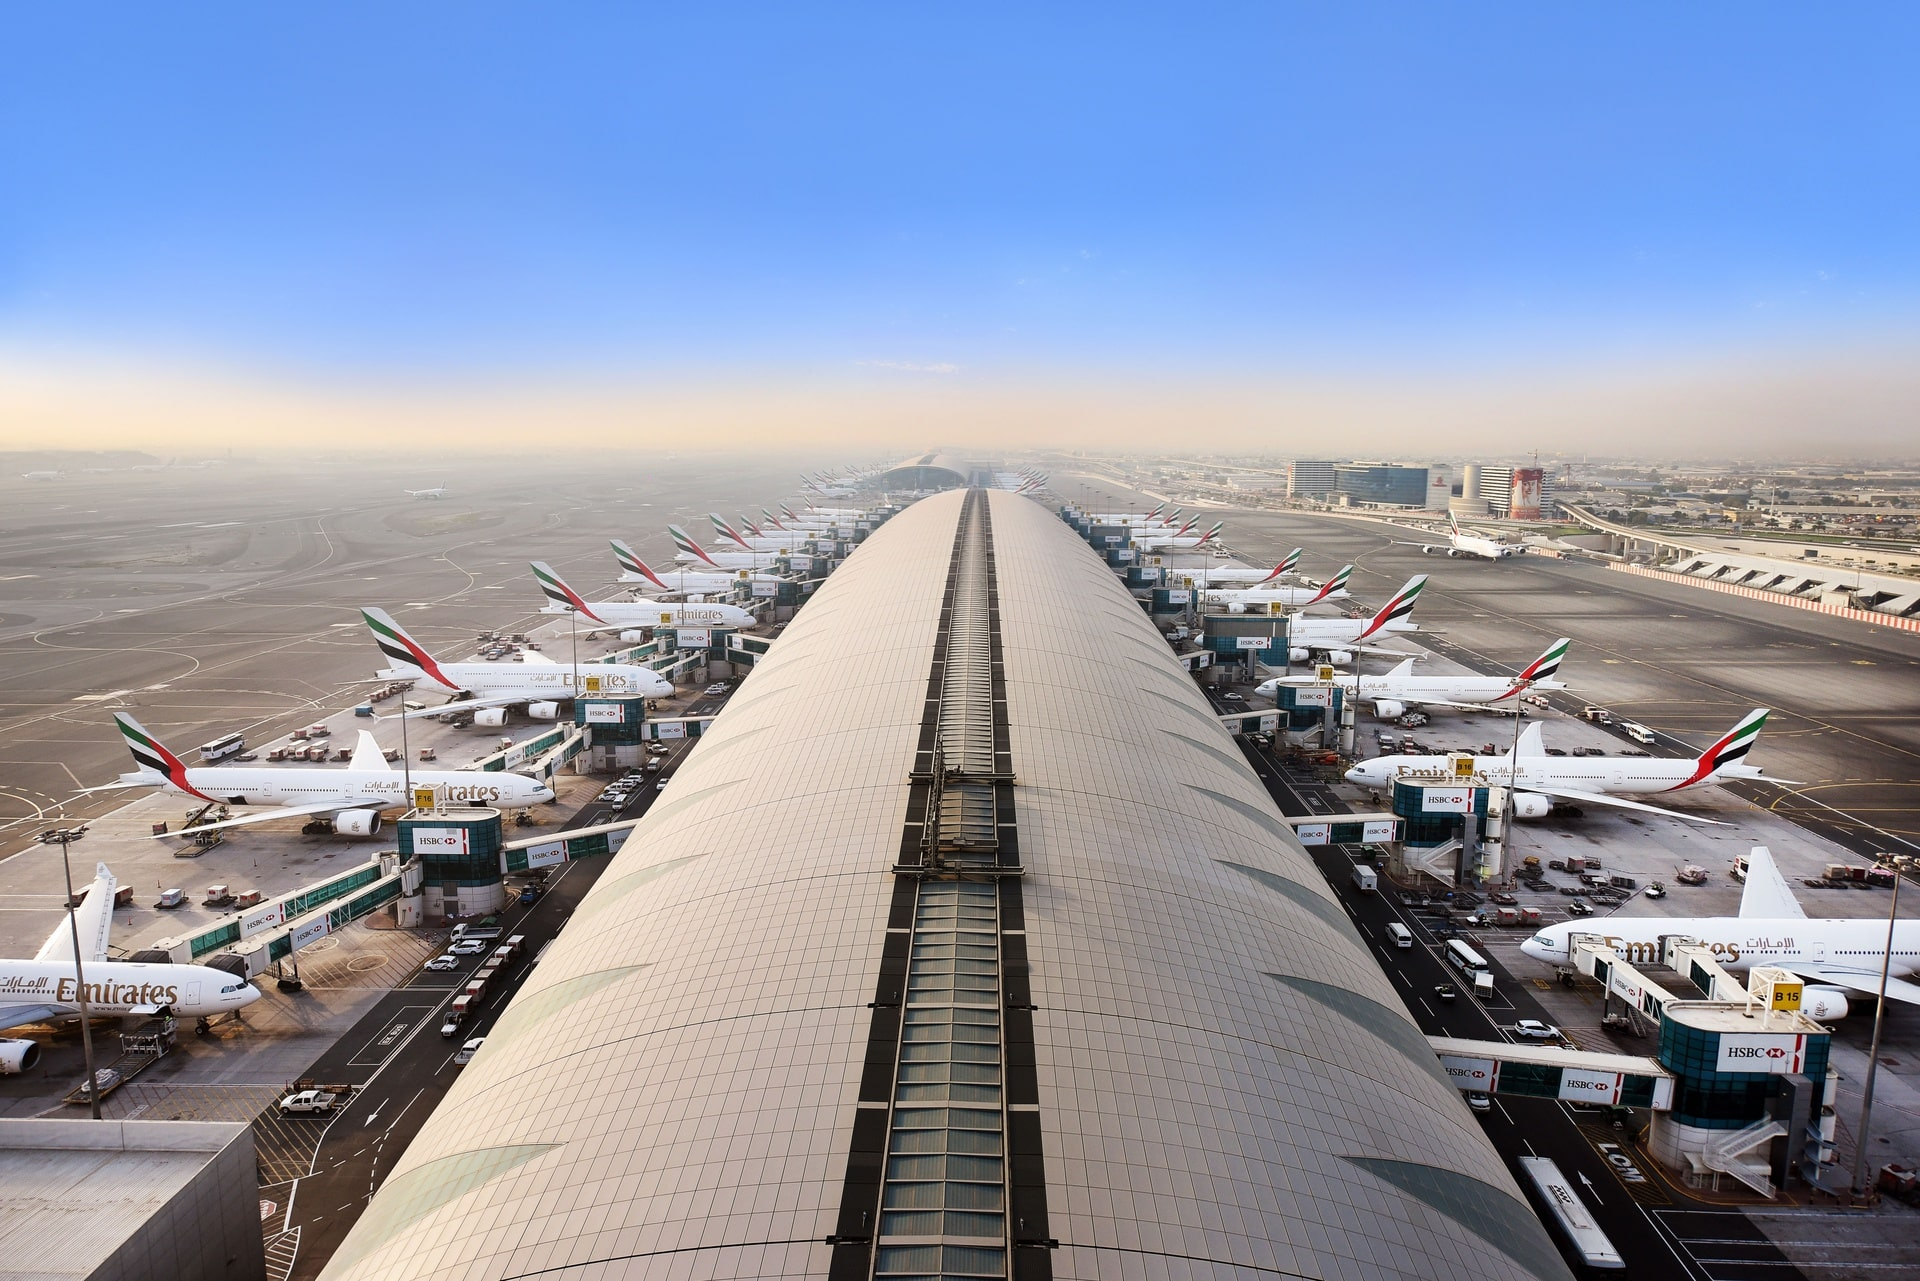 Dubai Airport Emirates Terminal Aerial View